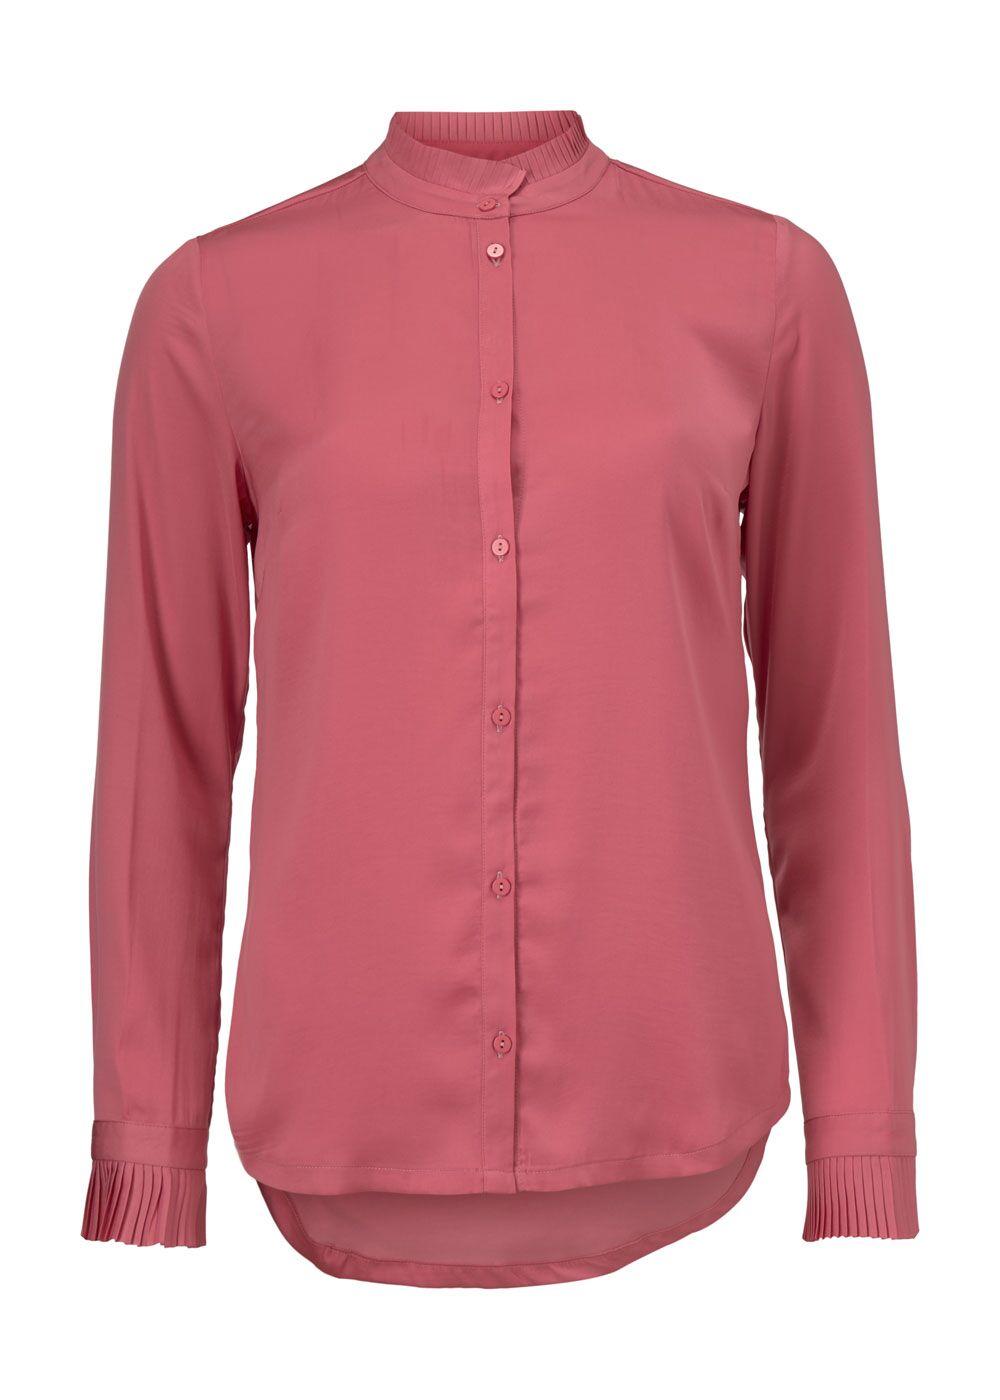 Noelle Shirt - Rose Passion